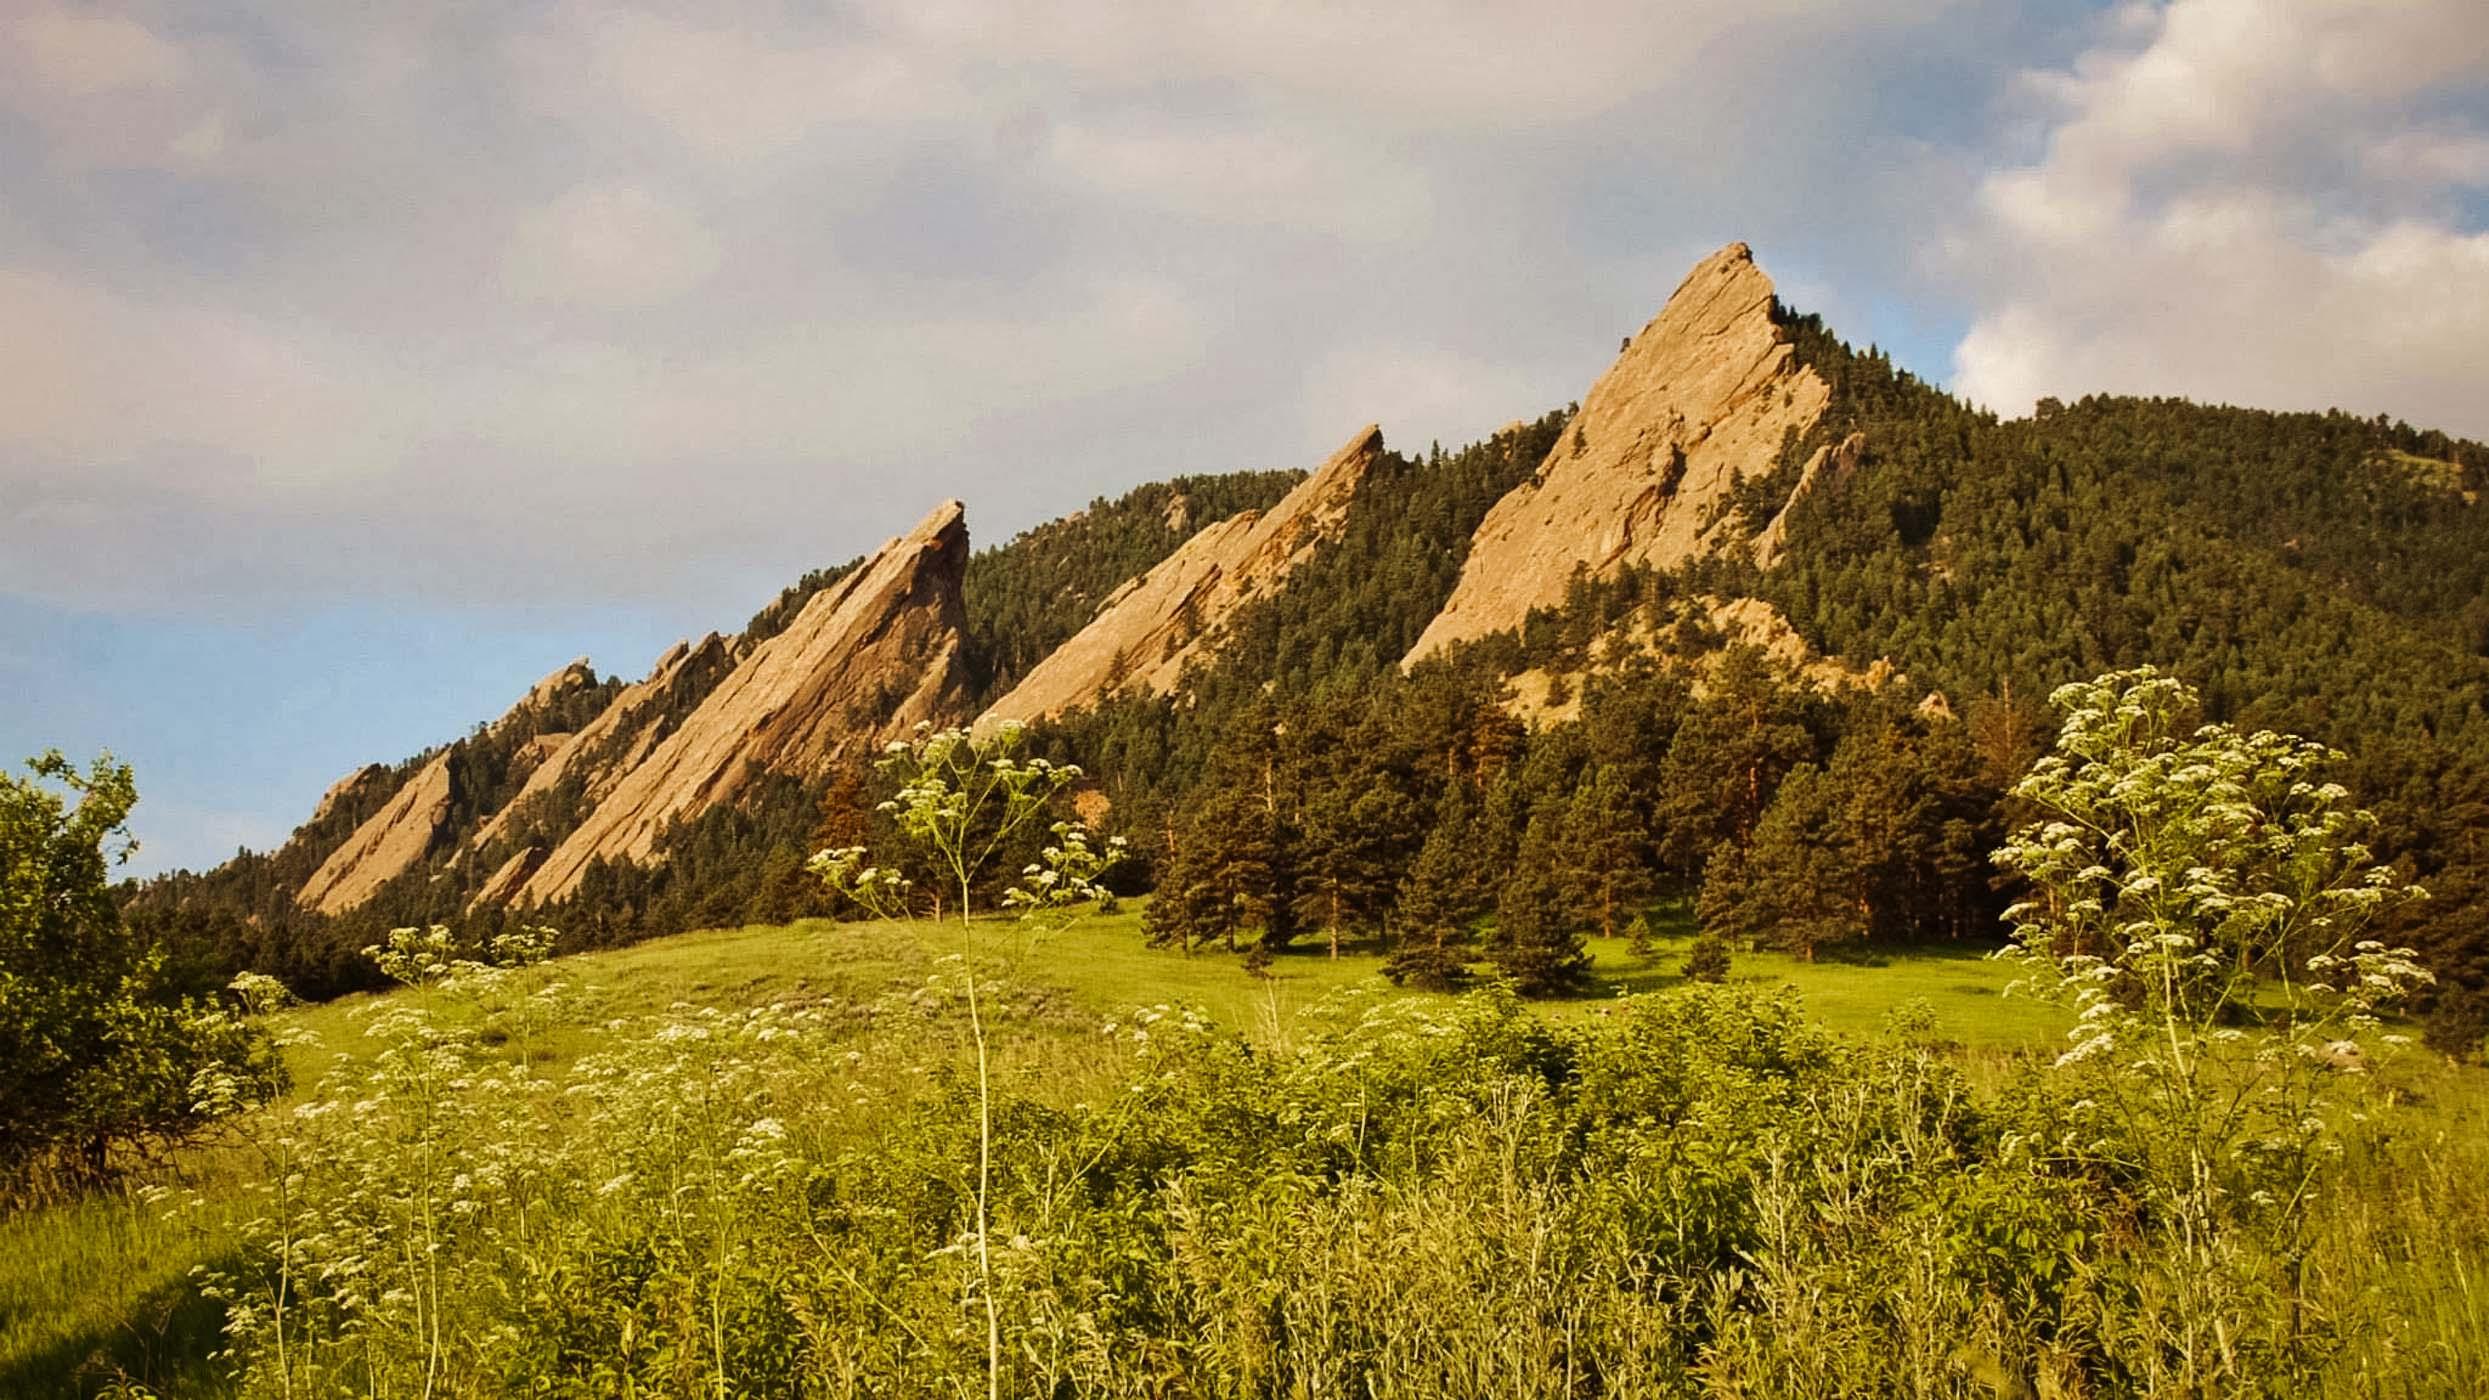 Boulder Flatirons by Lori Heintzelman